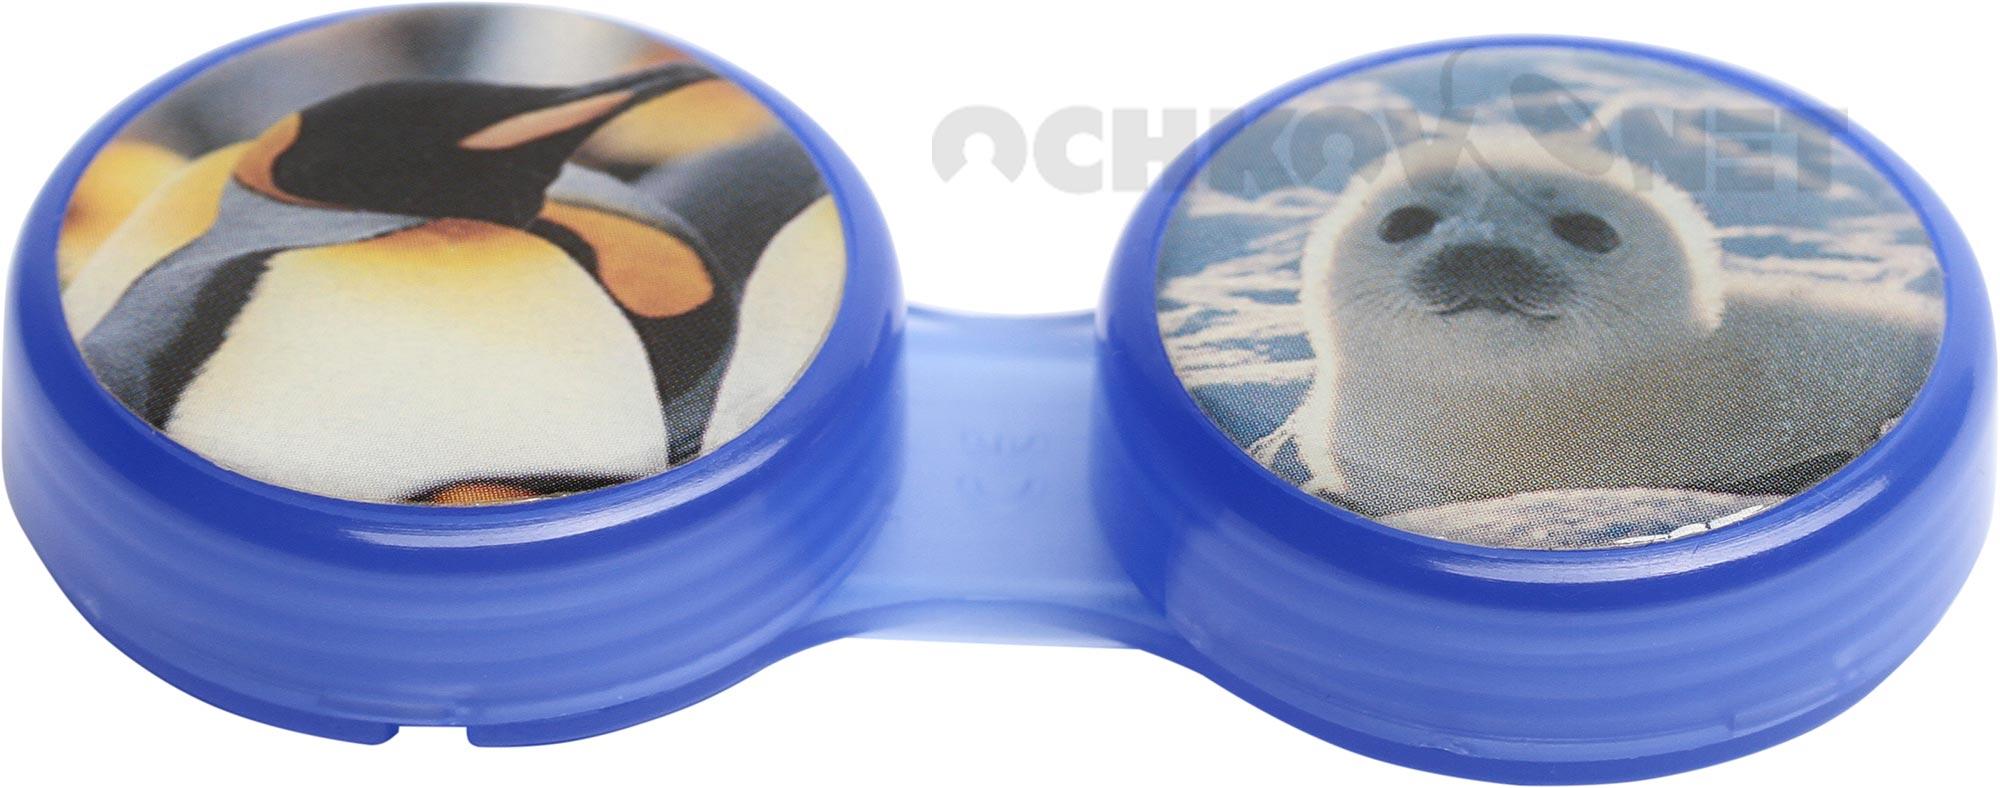 Контейнер SC-212 picture cap №2 пингвин